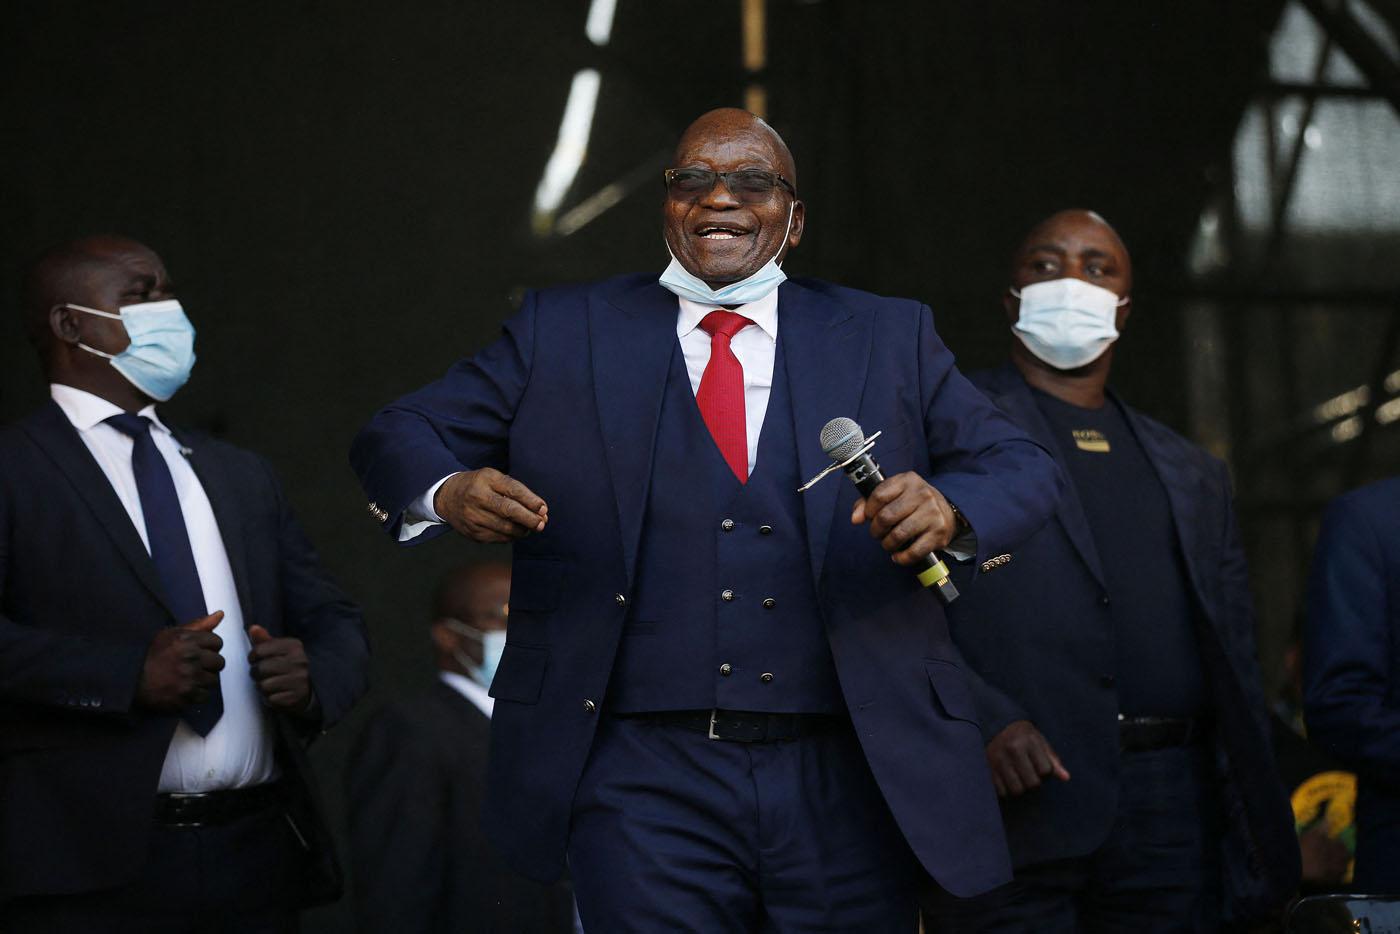 SAFRICA-POLITICS-CORRUPTION-TRIAL-ZUMA